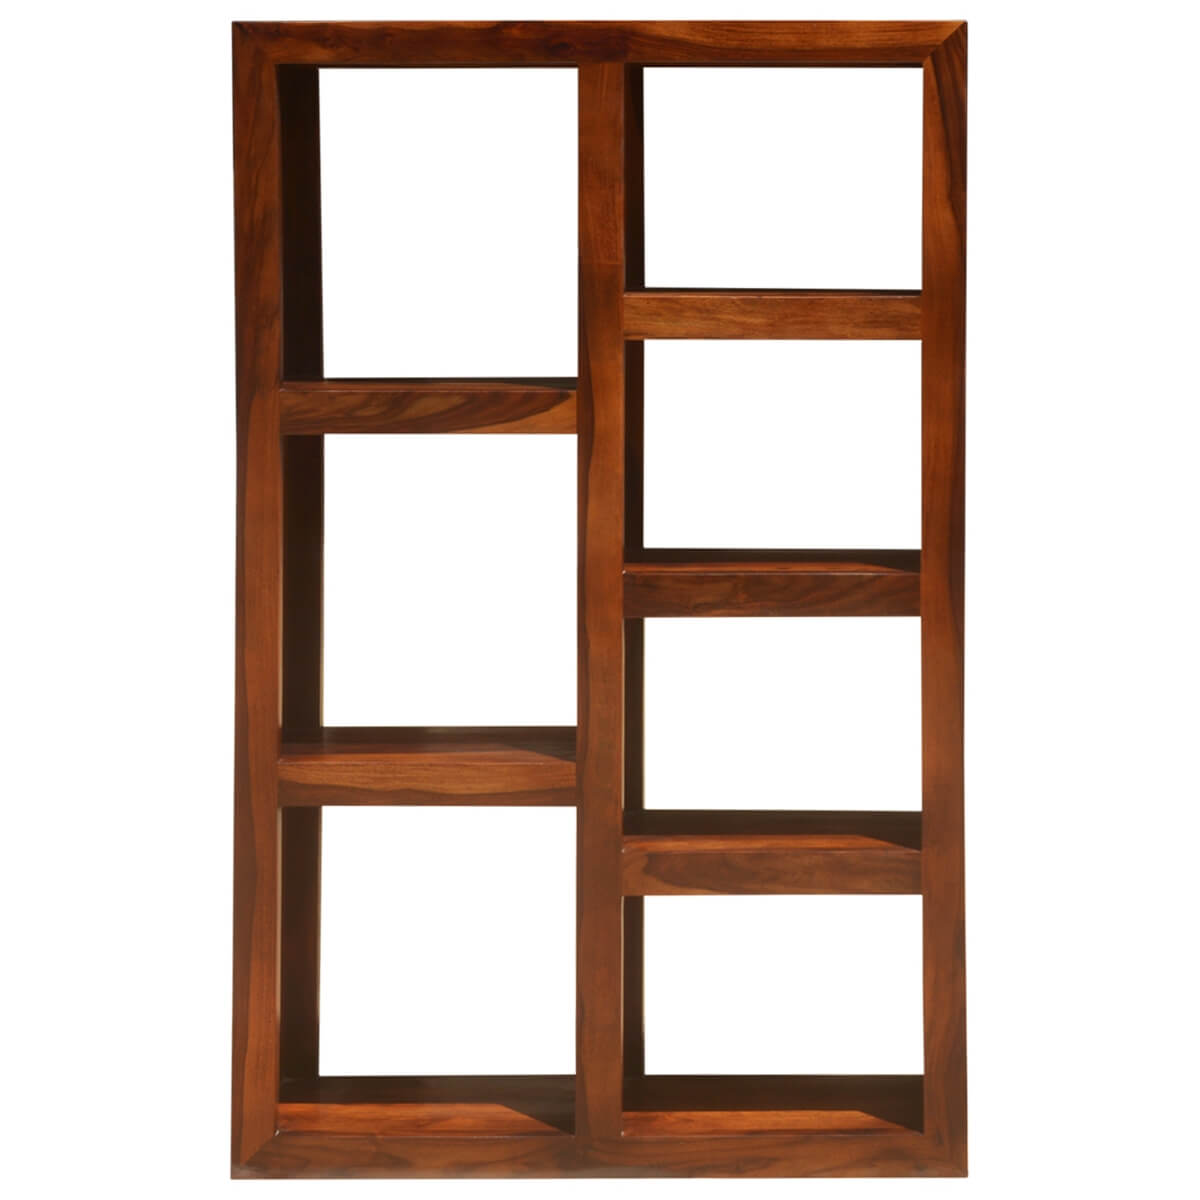 Solid Wood Modern Display Rack Cube Bookcase Shelf Room